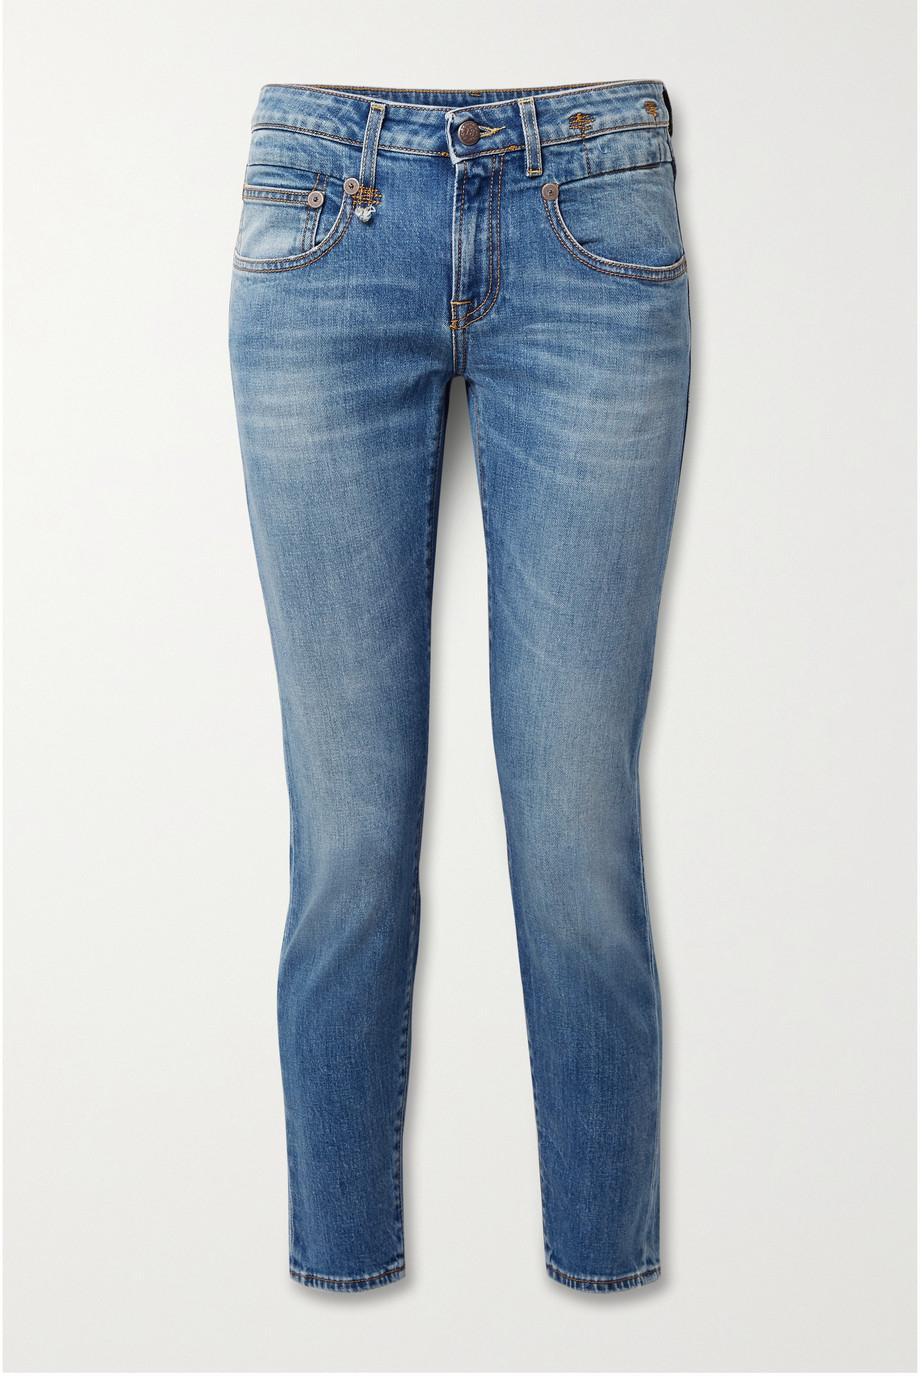 R13 Boy cropped slim boyfriend jeans